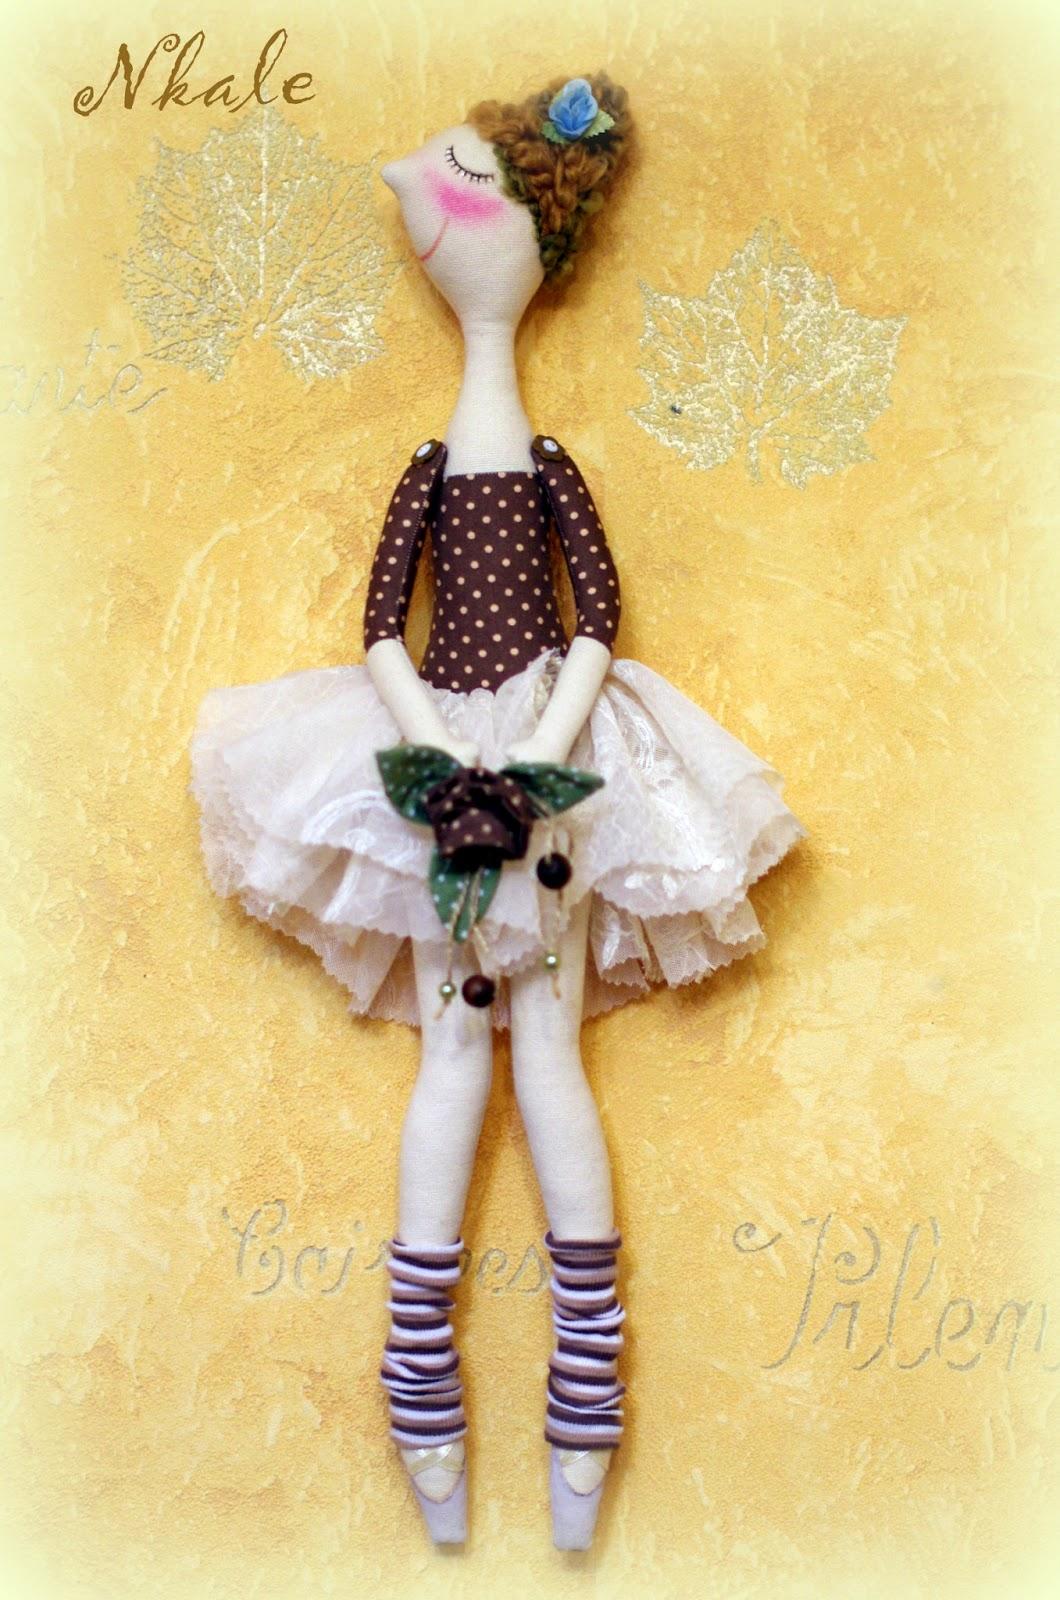 Шитье мастер класс челябинск кукла nkale  #2